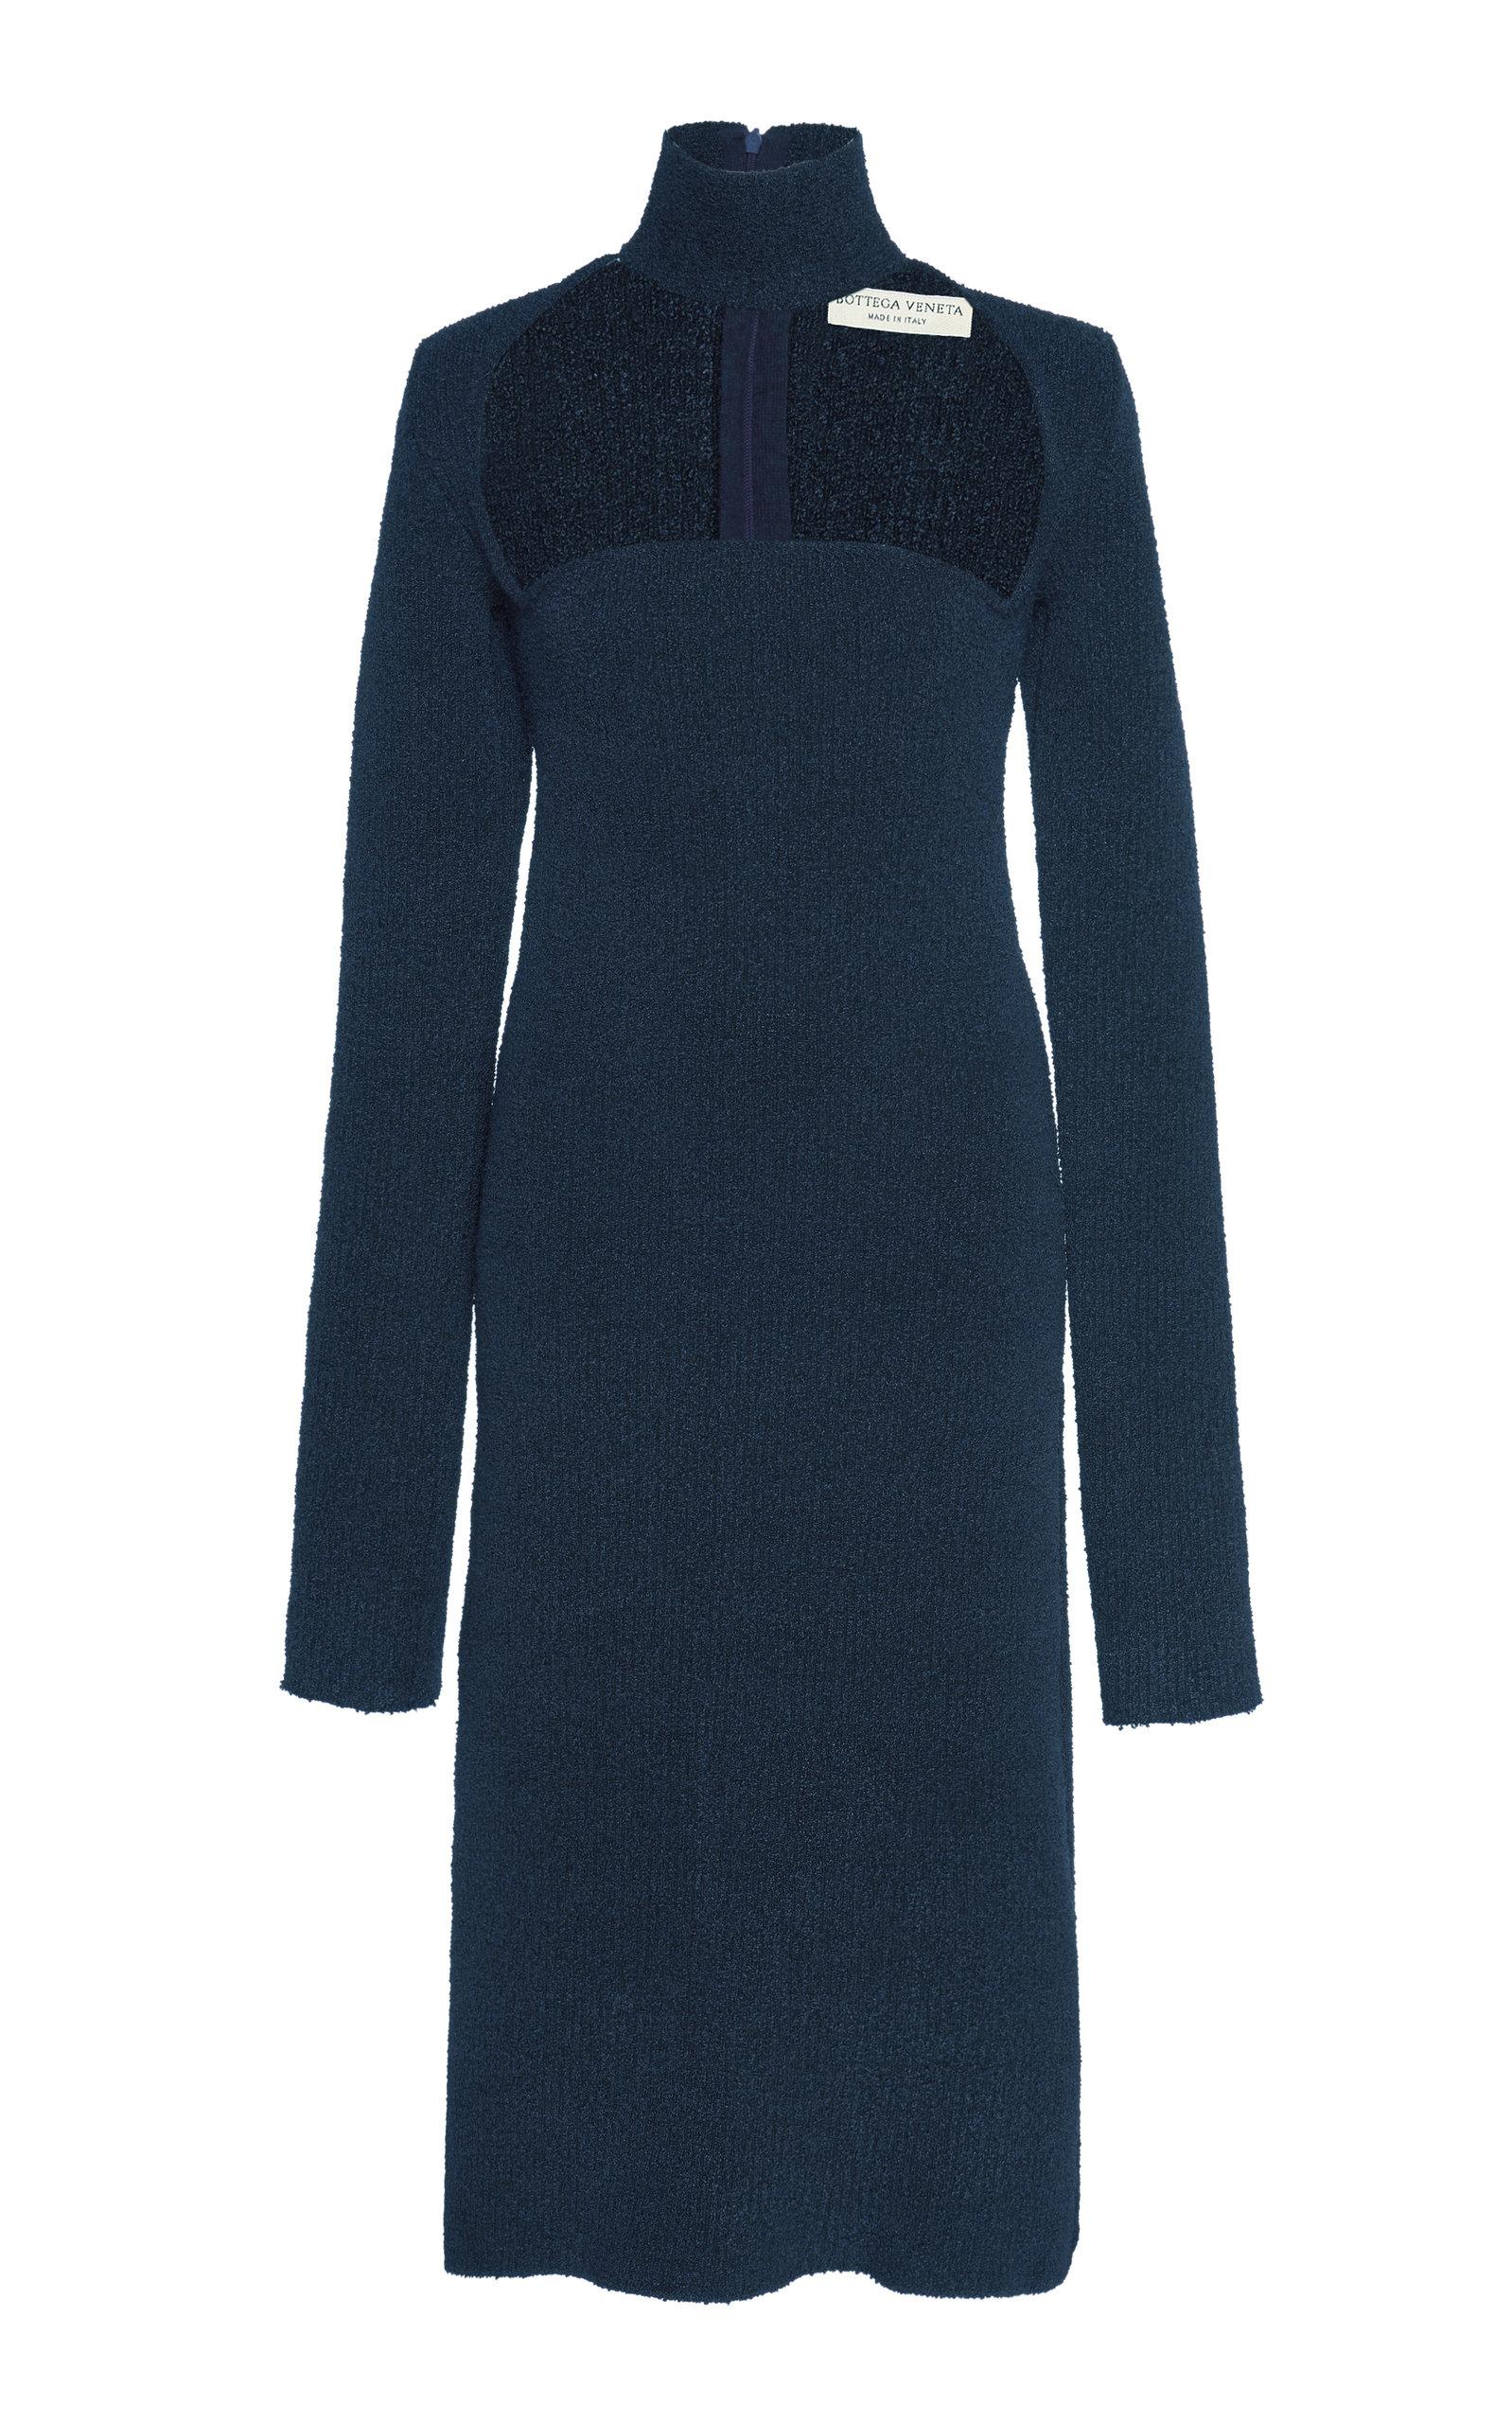 Buy Bottega Veneta Cutout Turtleneck Stretch-Wool Crepe Dress online, shop Bottega Veneta at the best price